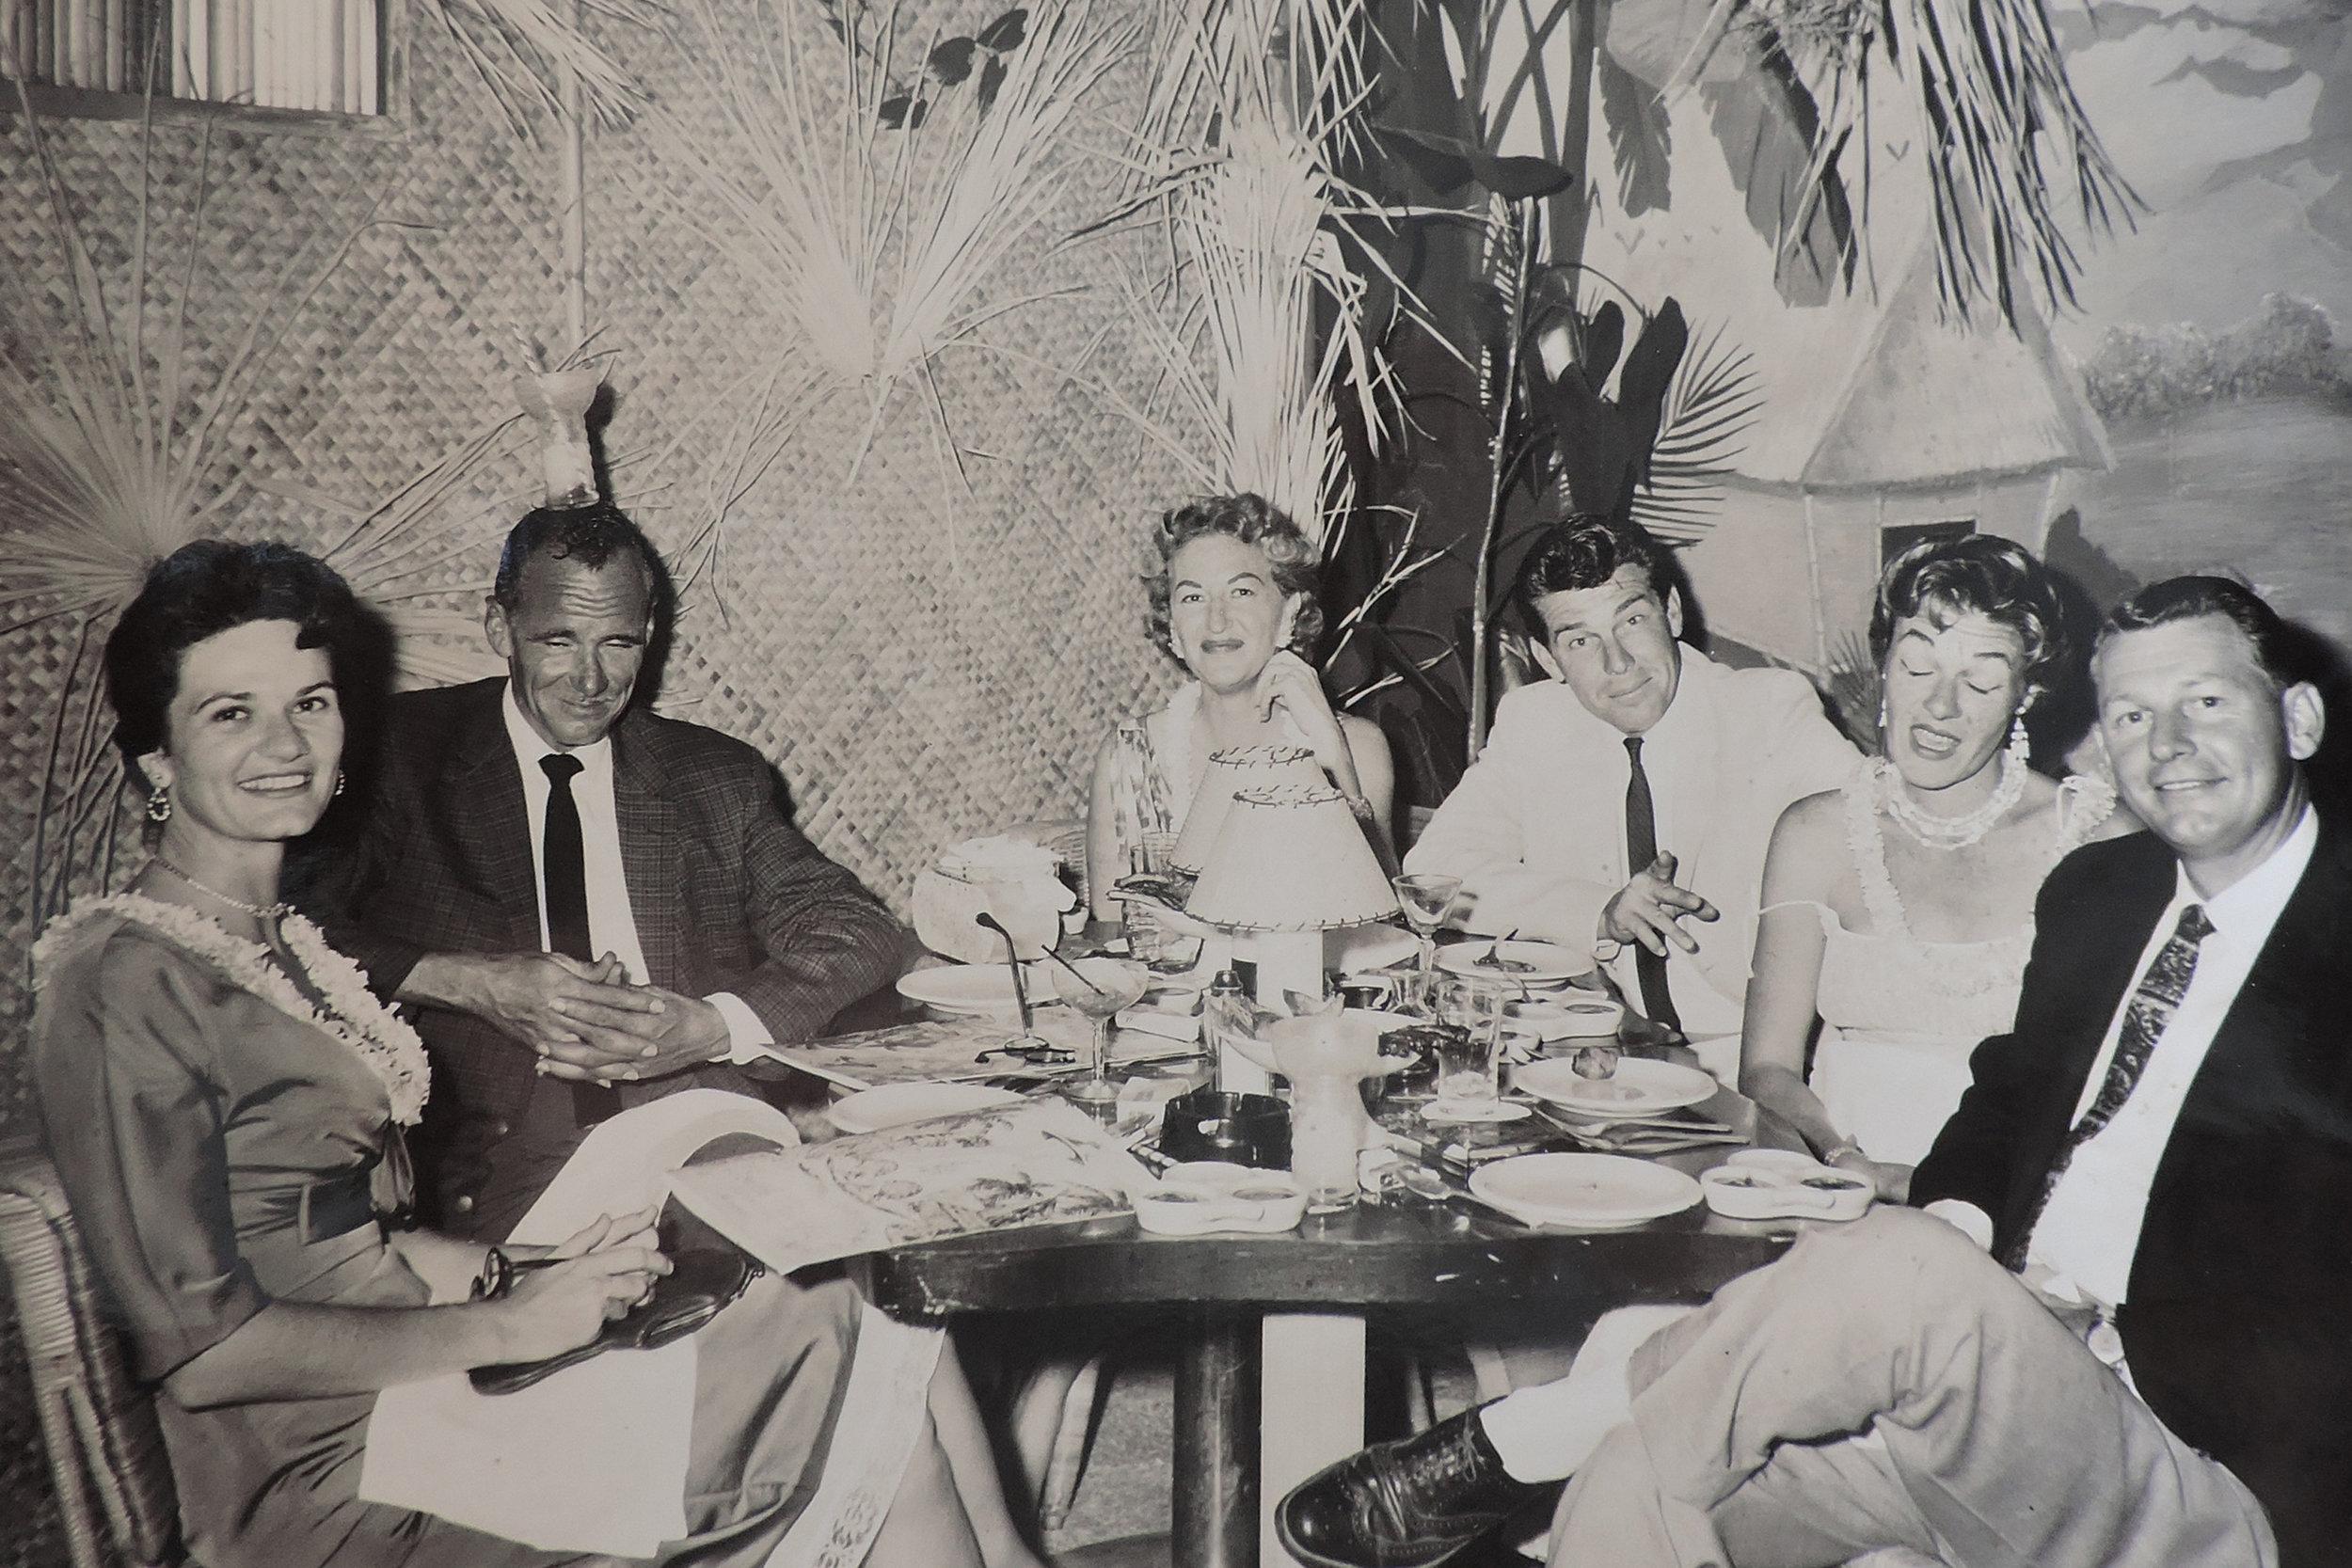 Nancy Hawthorne (far left) and Cal Hawthorne (far right) with friends.